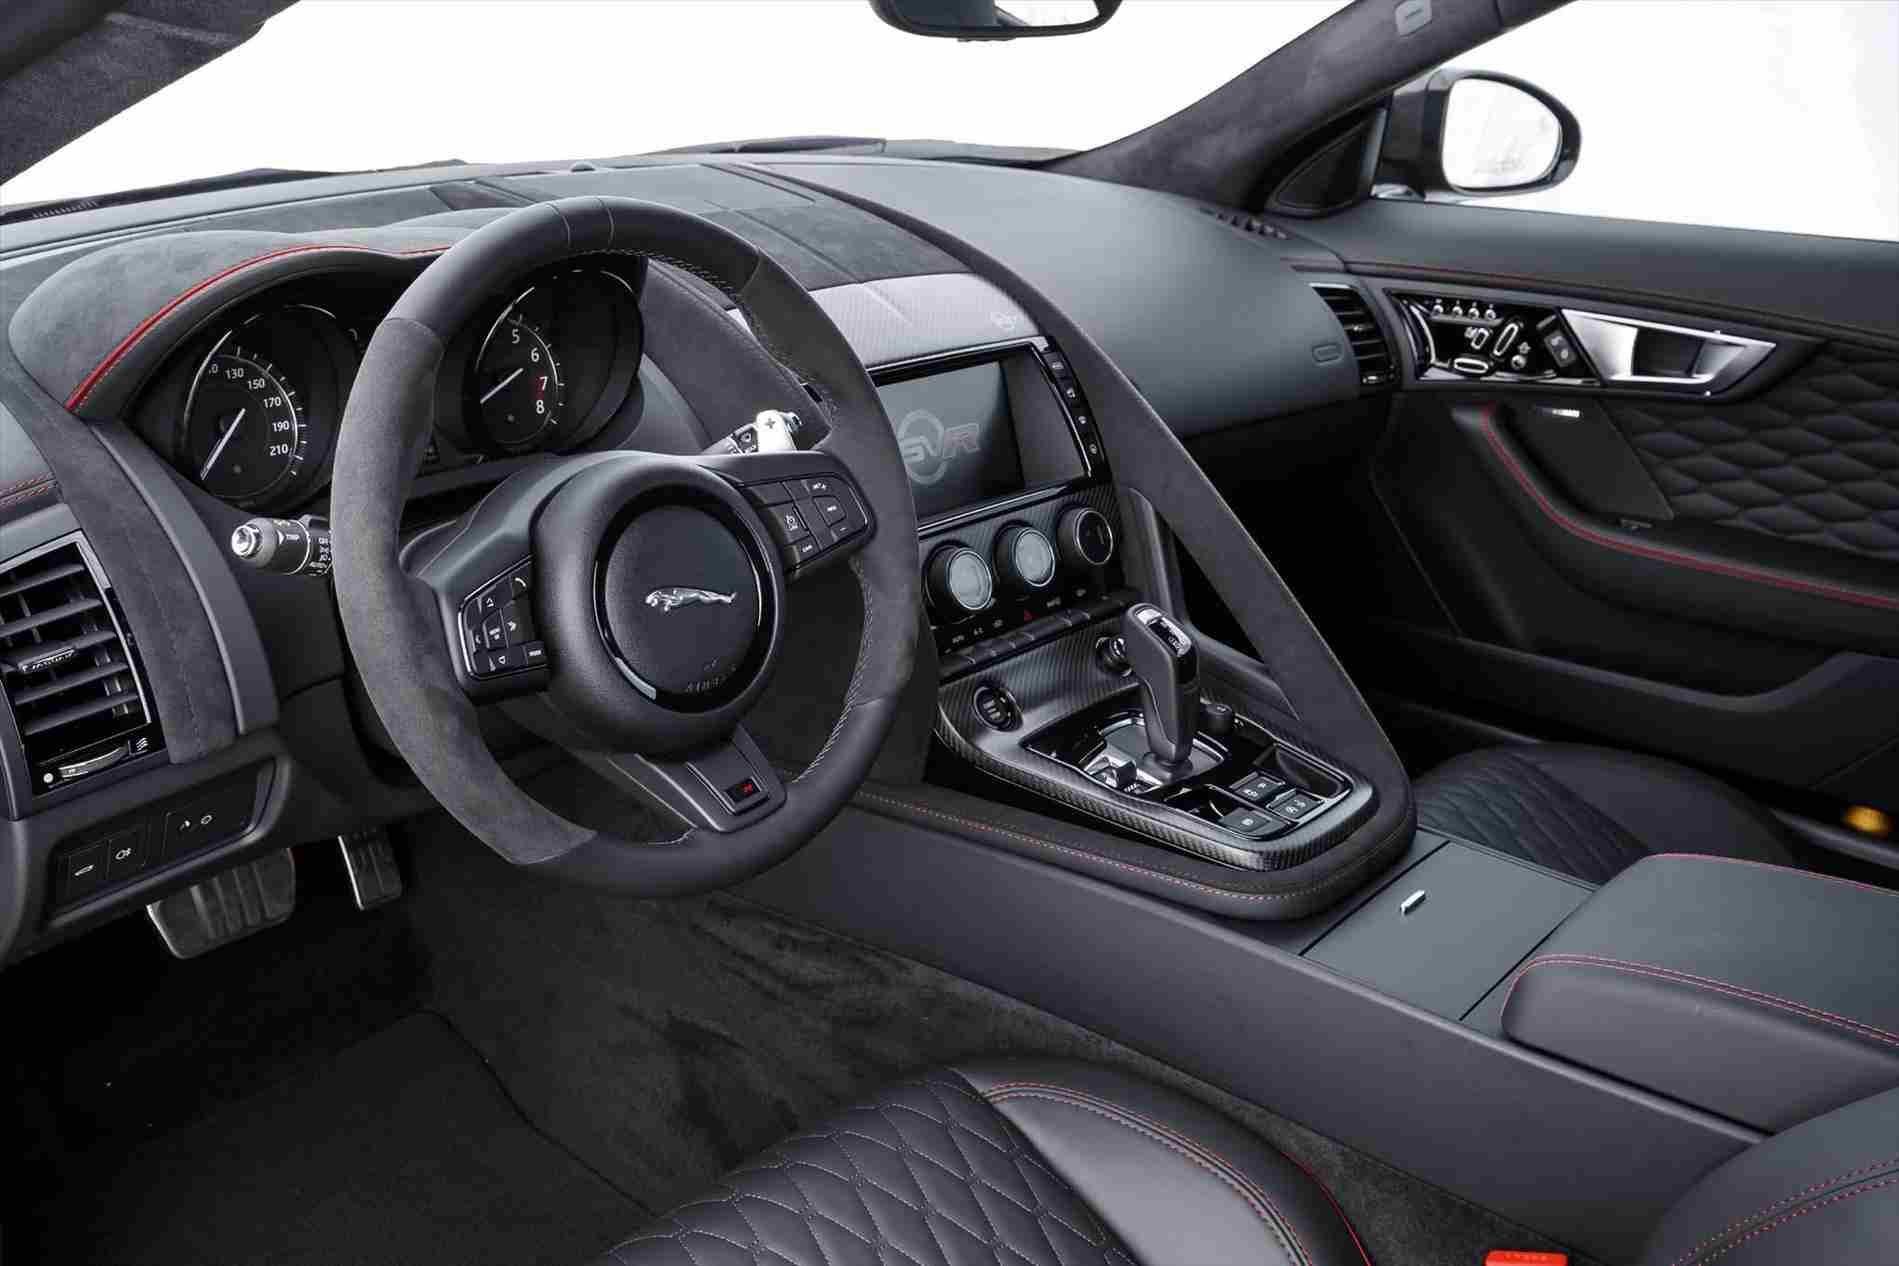 2015 jaguar f type project 7 interior steering wheel wallpaper 2015 jaguar f type project 7 interior steering wheel wallpaper 2014 jaguar f voltagebd Gallery